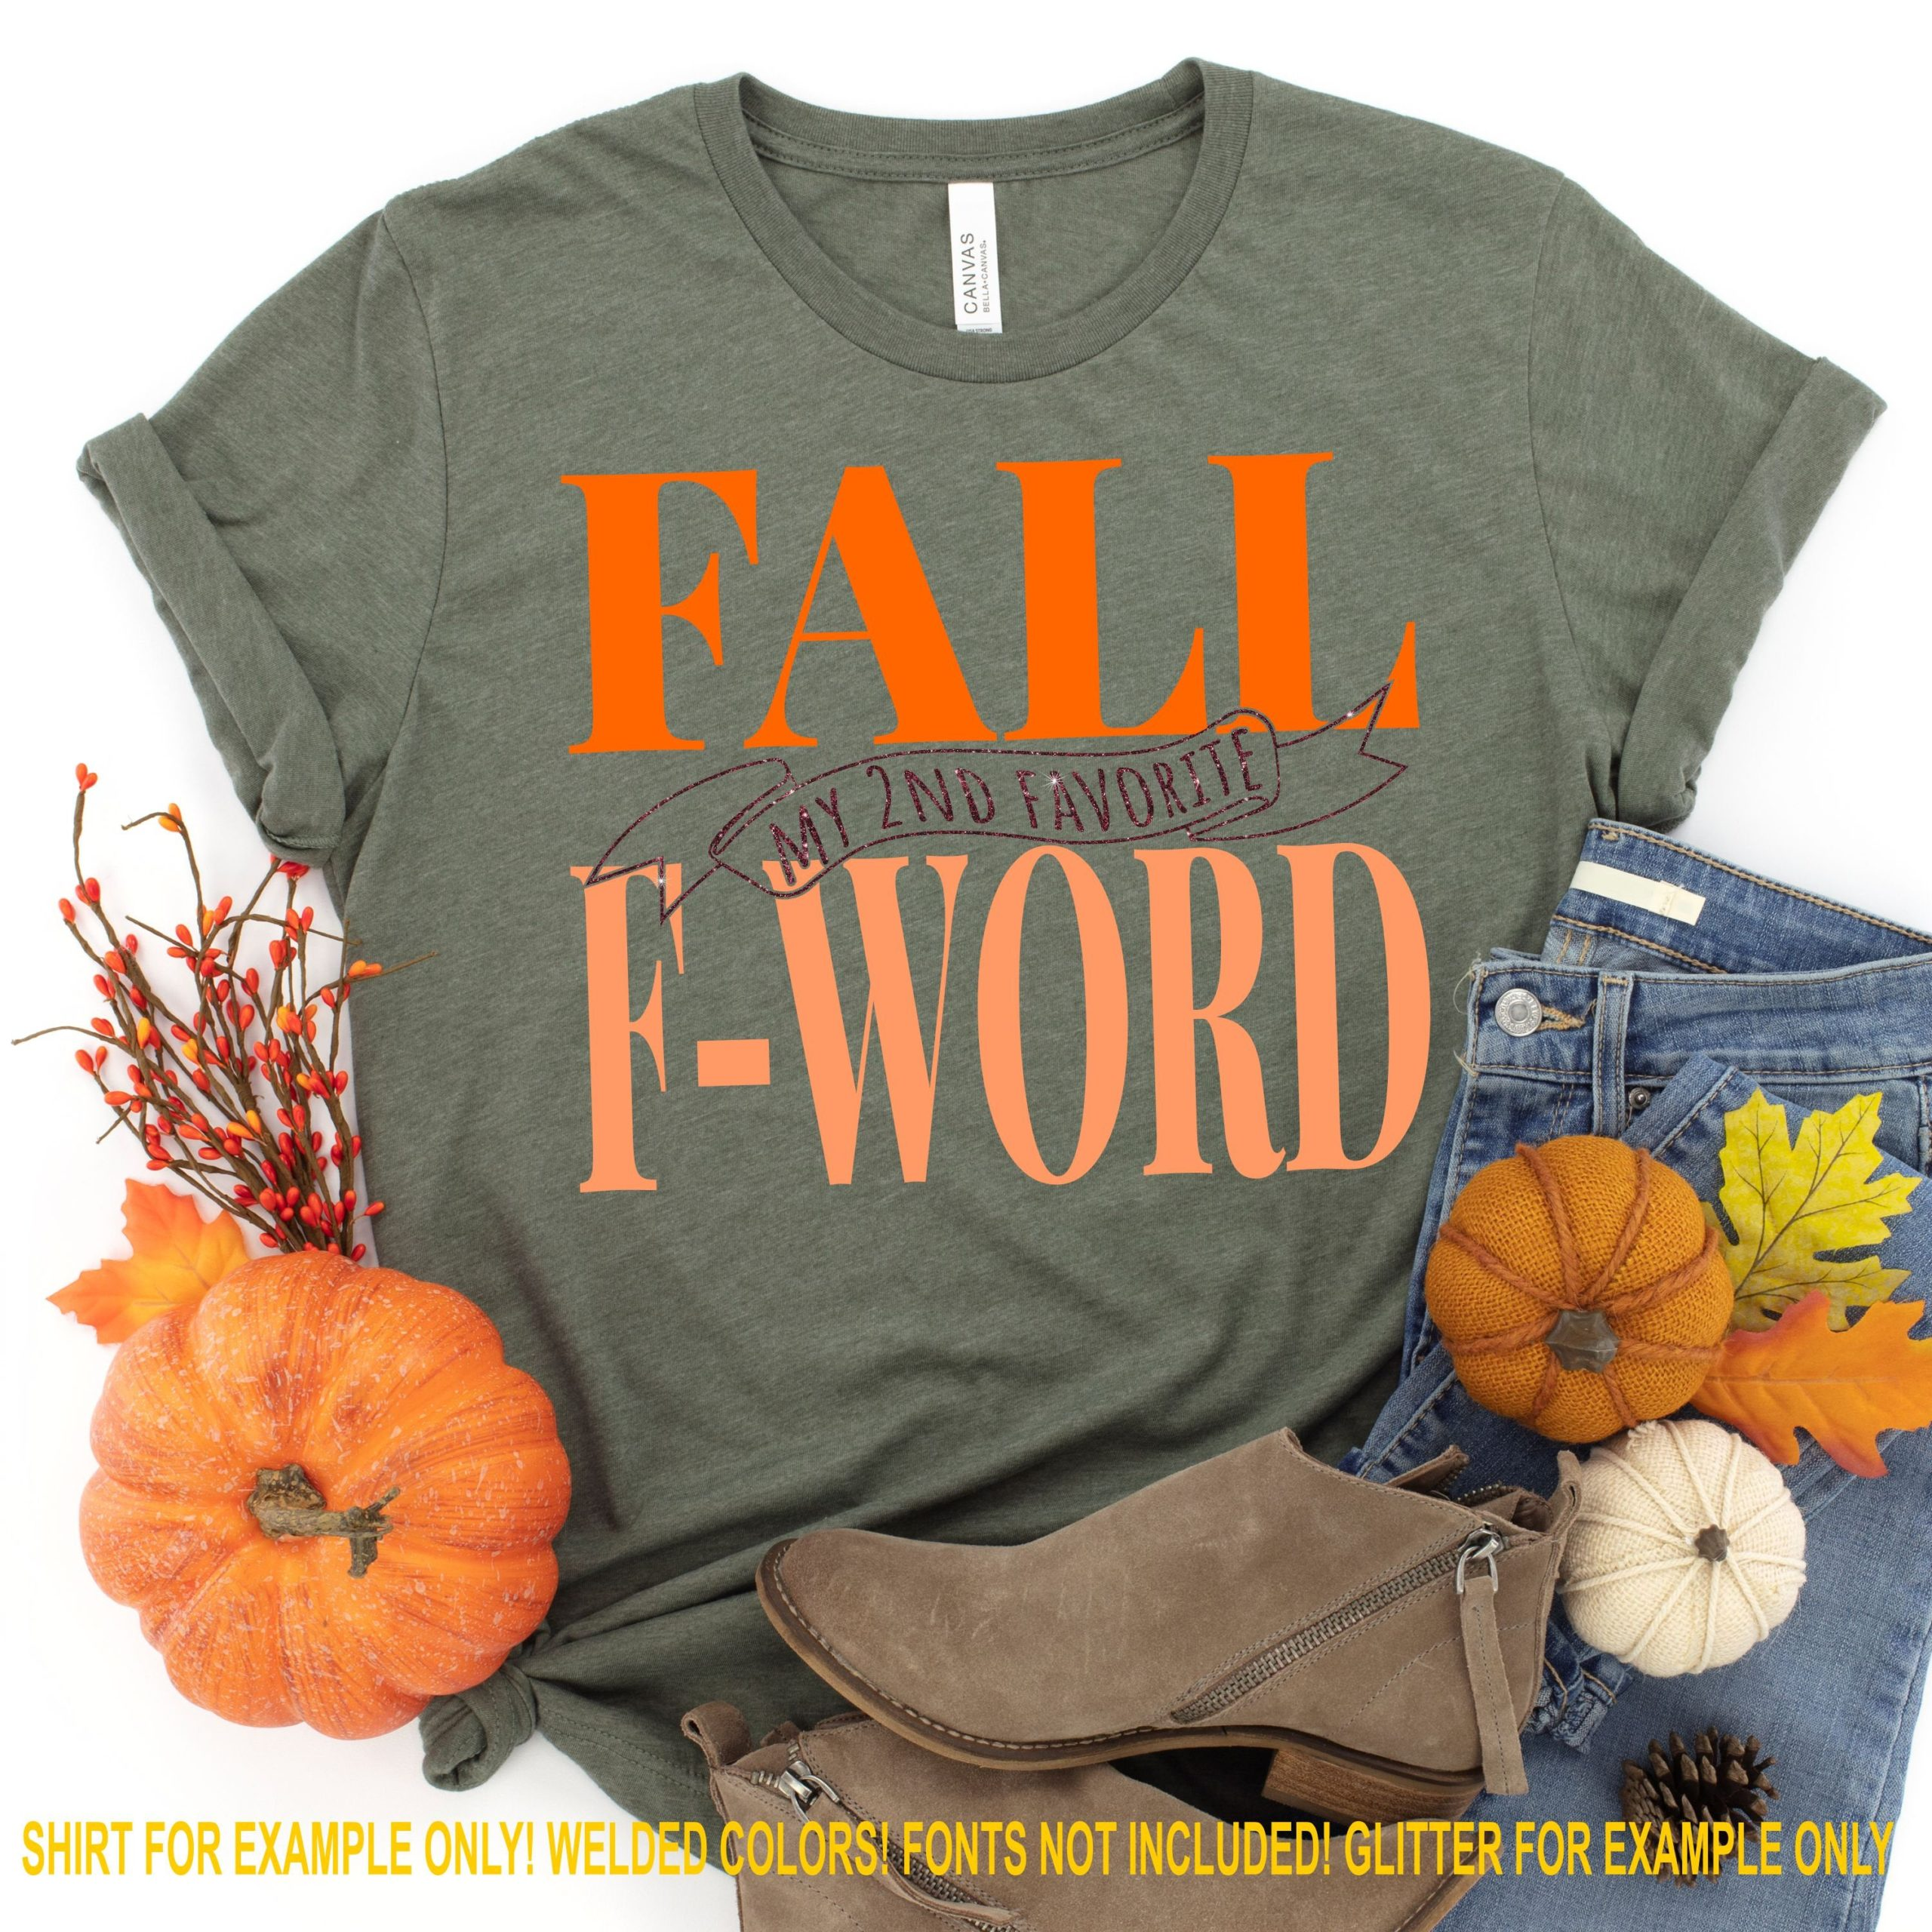 Fall-is-my-2nd-favorite-f-word-svg-fall-svg-fall-quote-seasons-fall-saying-fall-svg-designs-fall-cut-files-cricut-cut-files-5f721926